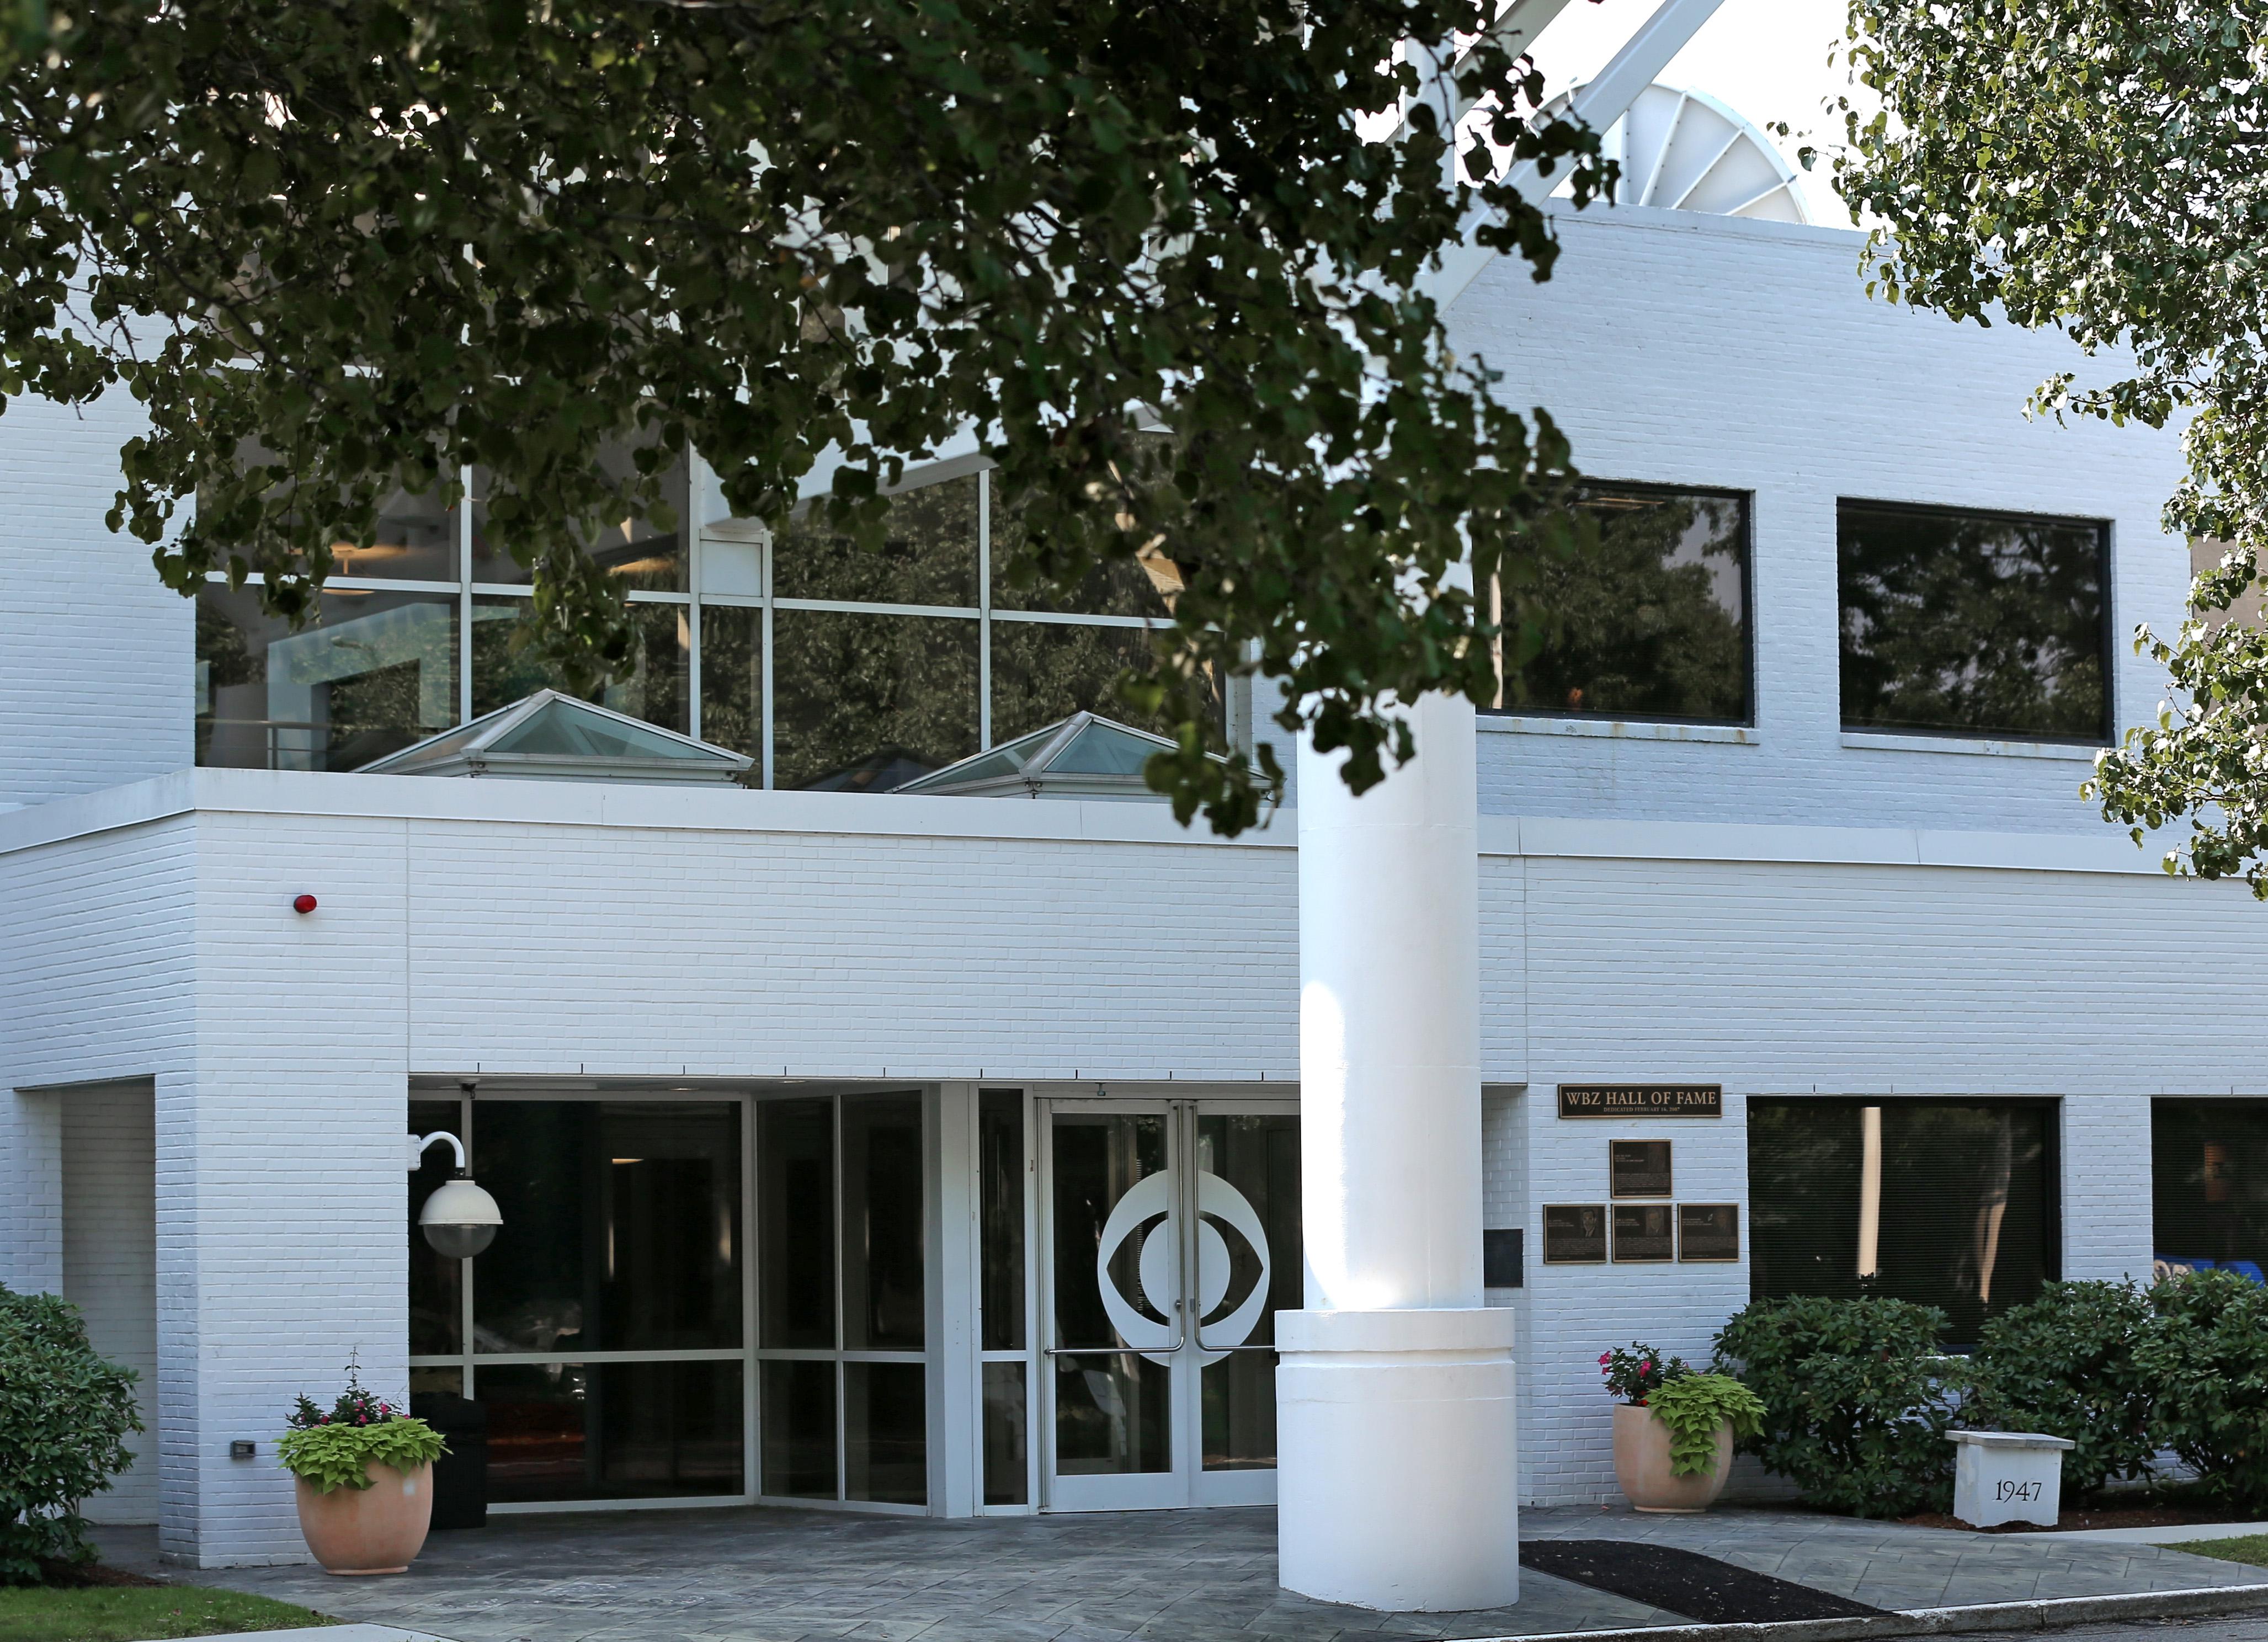 WBZ-TV to get new studio, adding to spate of Allston